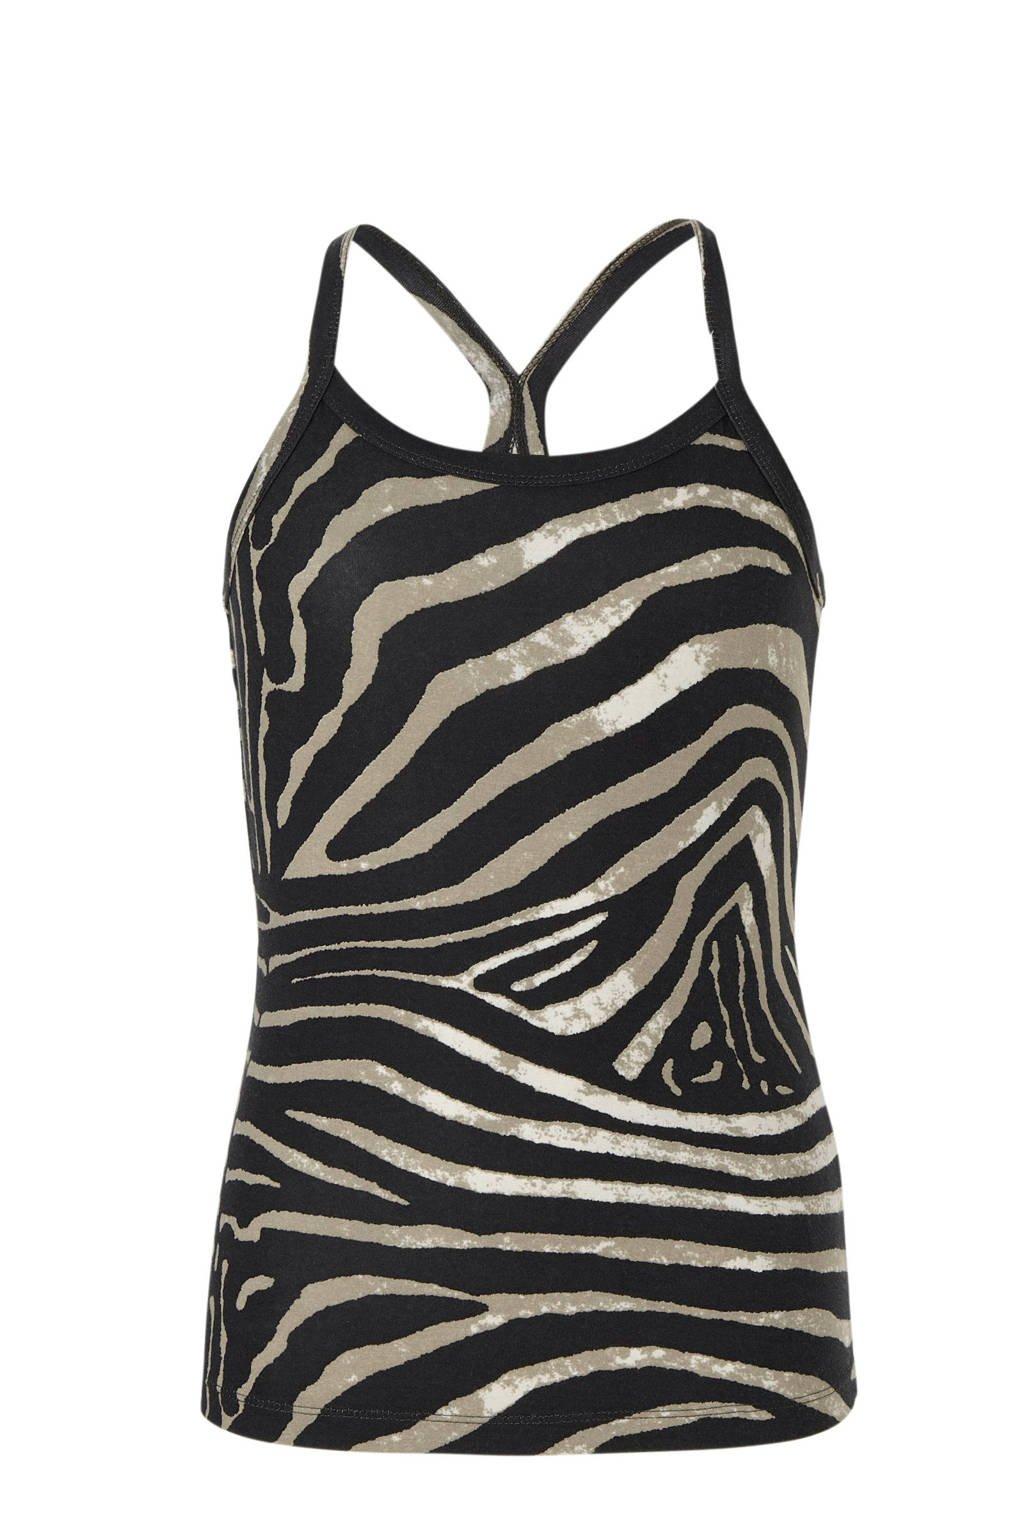 Geisha top met zebraprint zand/zwart, Zand/zwart